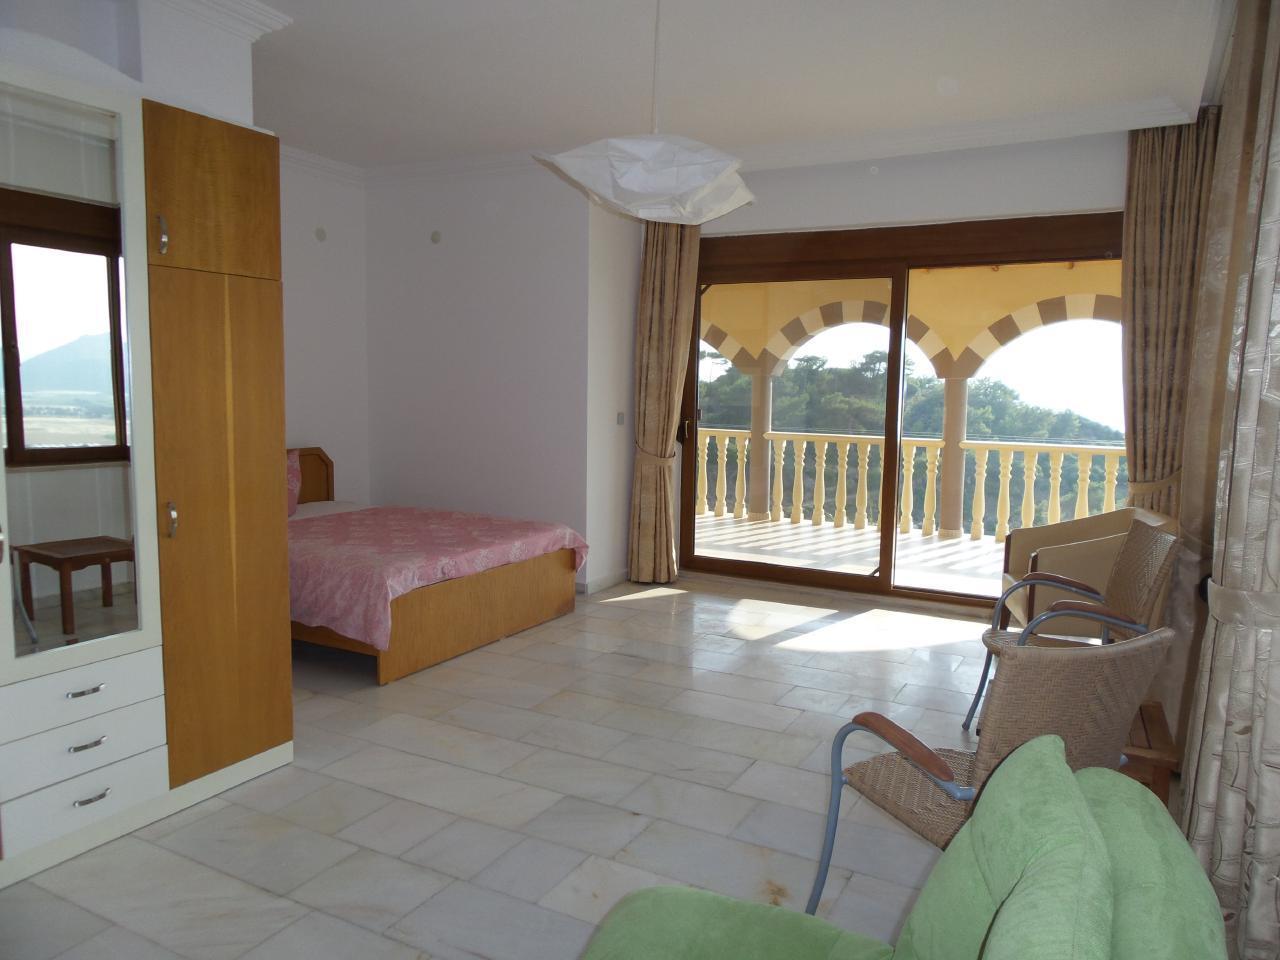 Ferienhaus Villa Gazipasa/Alanya-Gazipasa 200 Meter vom Meer (728528), Gazipasa, , Mittelmeerregion, Türkei, Bild 7